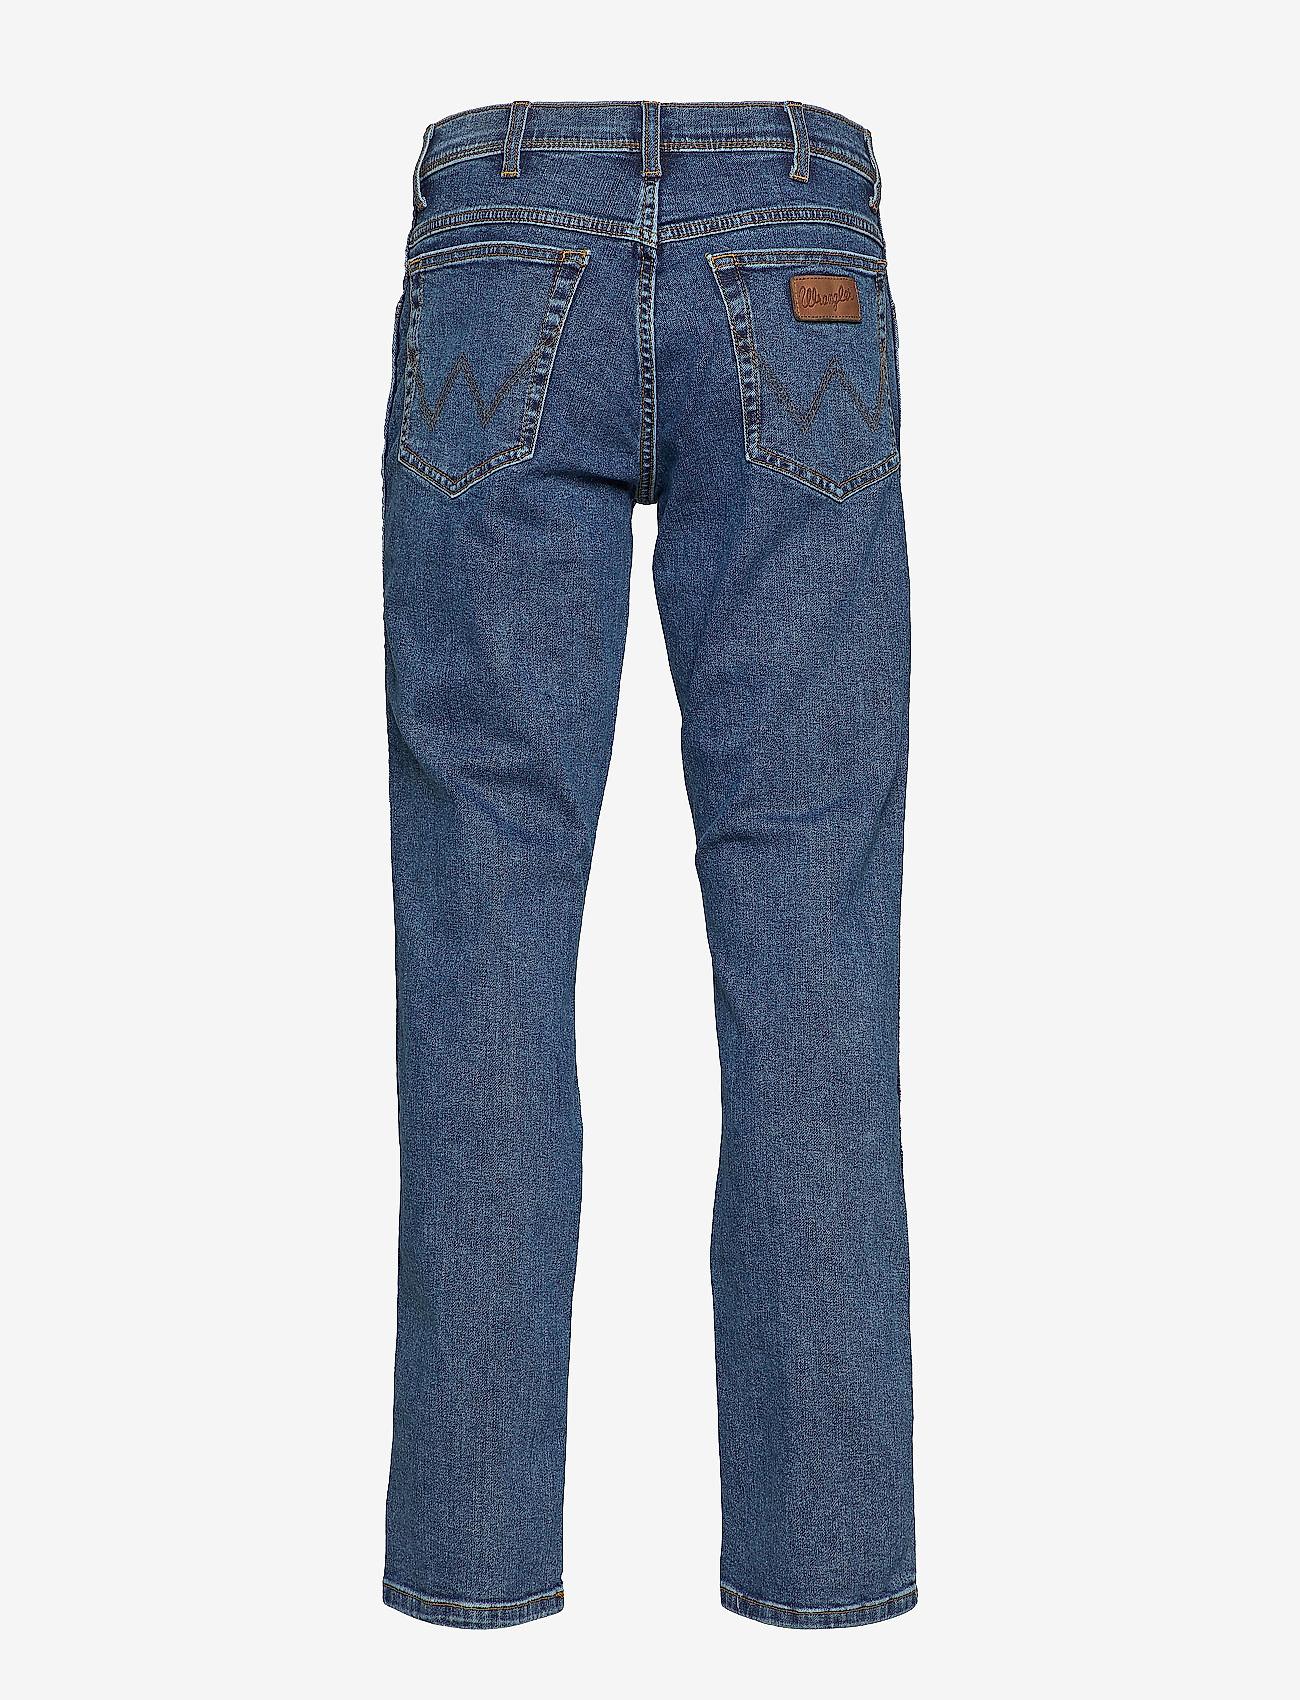 Wrangler TEXAS STRETCH - Jeans STONEWASH - Menn Klær